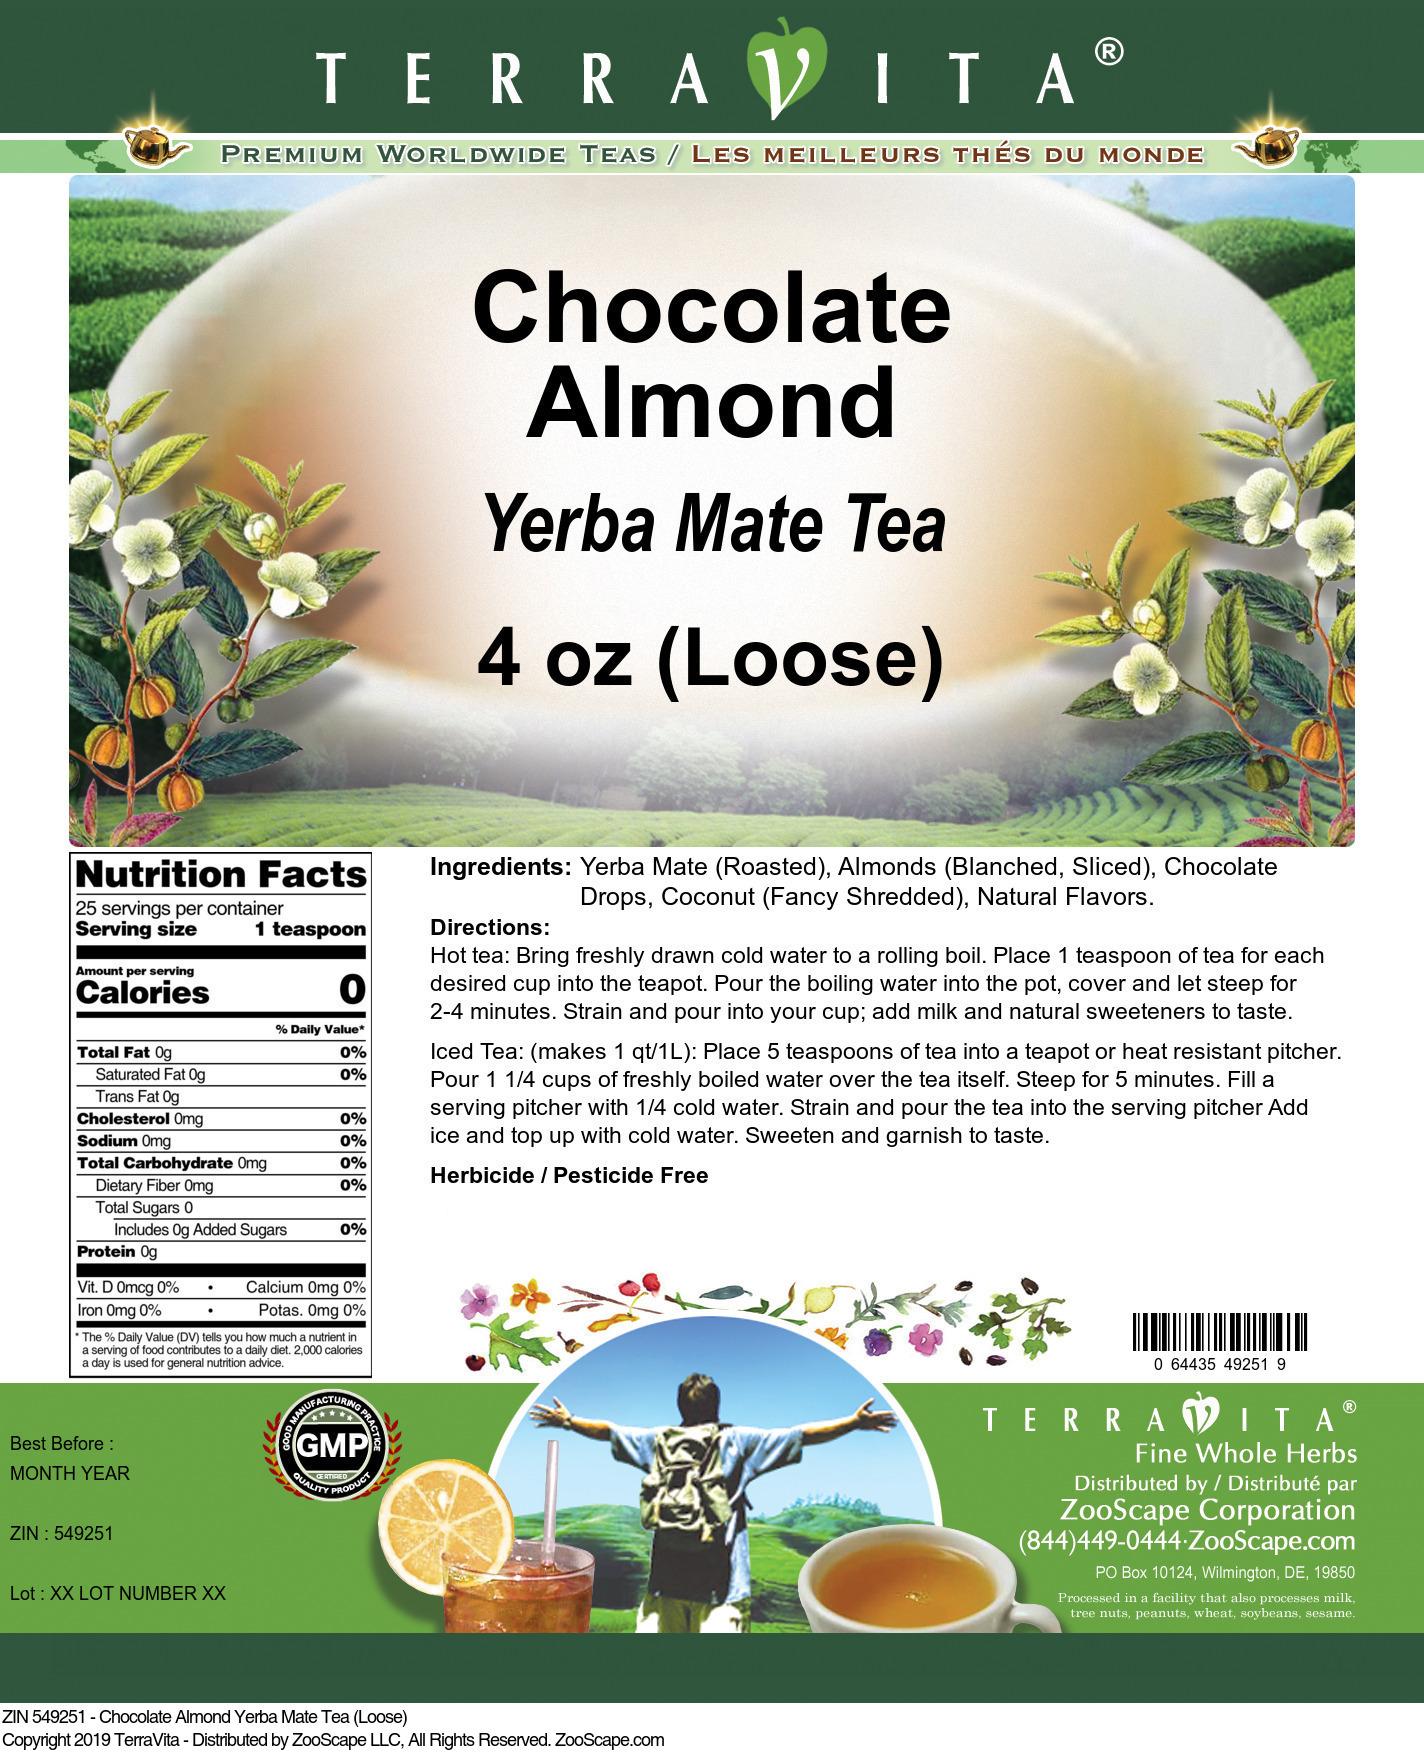 Chocolate Almond Yerba Mate